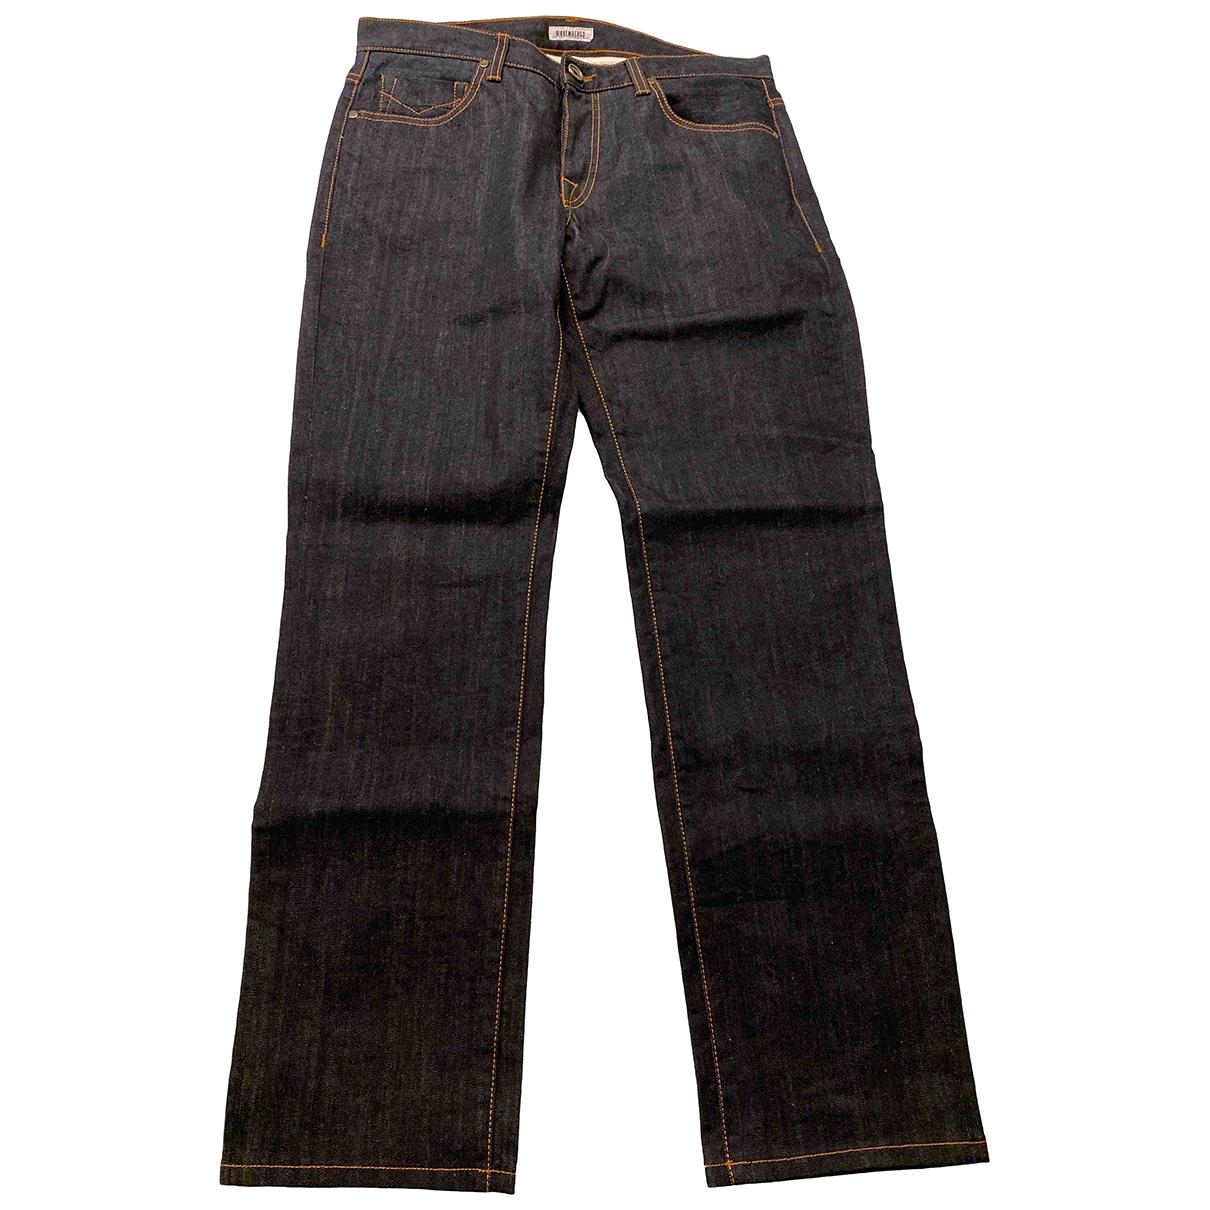 Dirk Bikkembergs \N Blue Cotton Jeans for Men 32 US